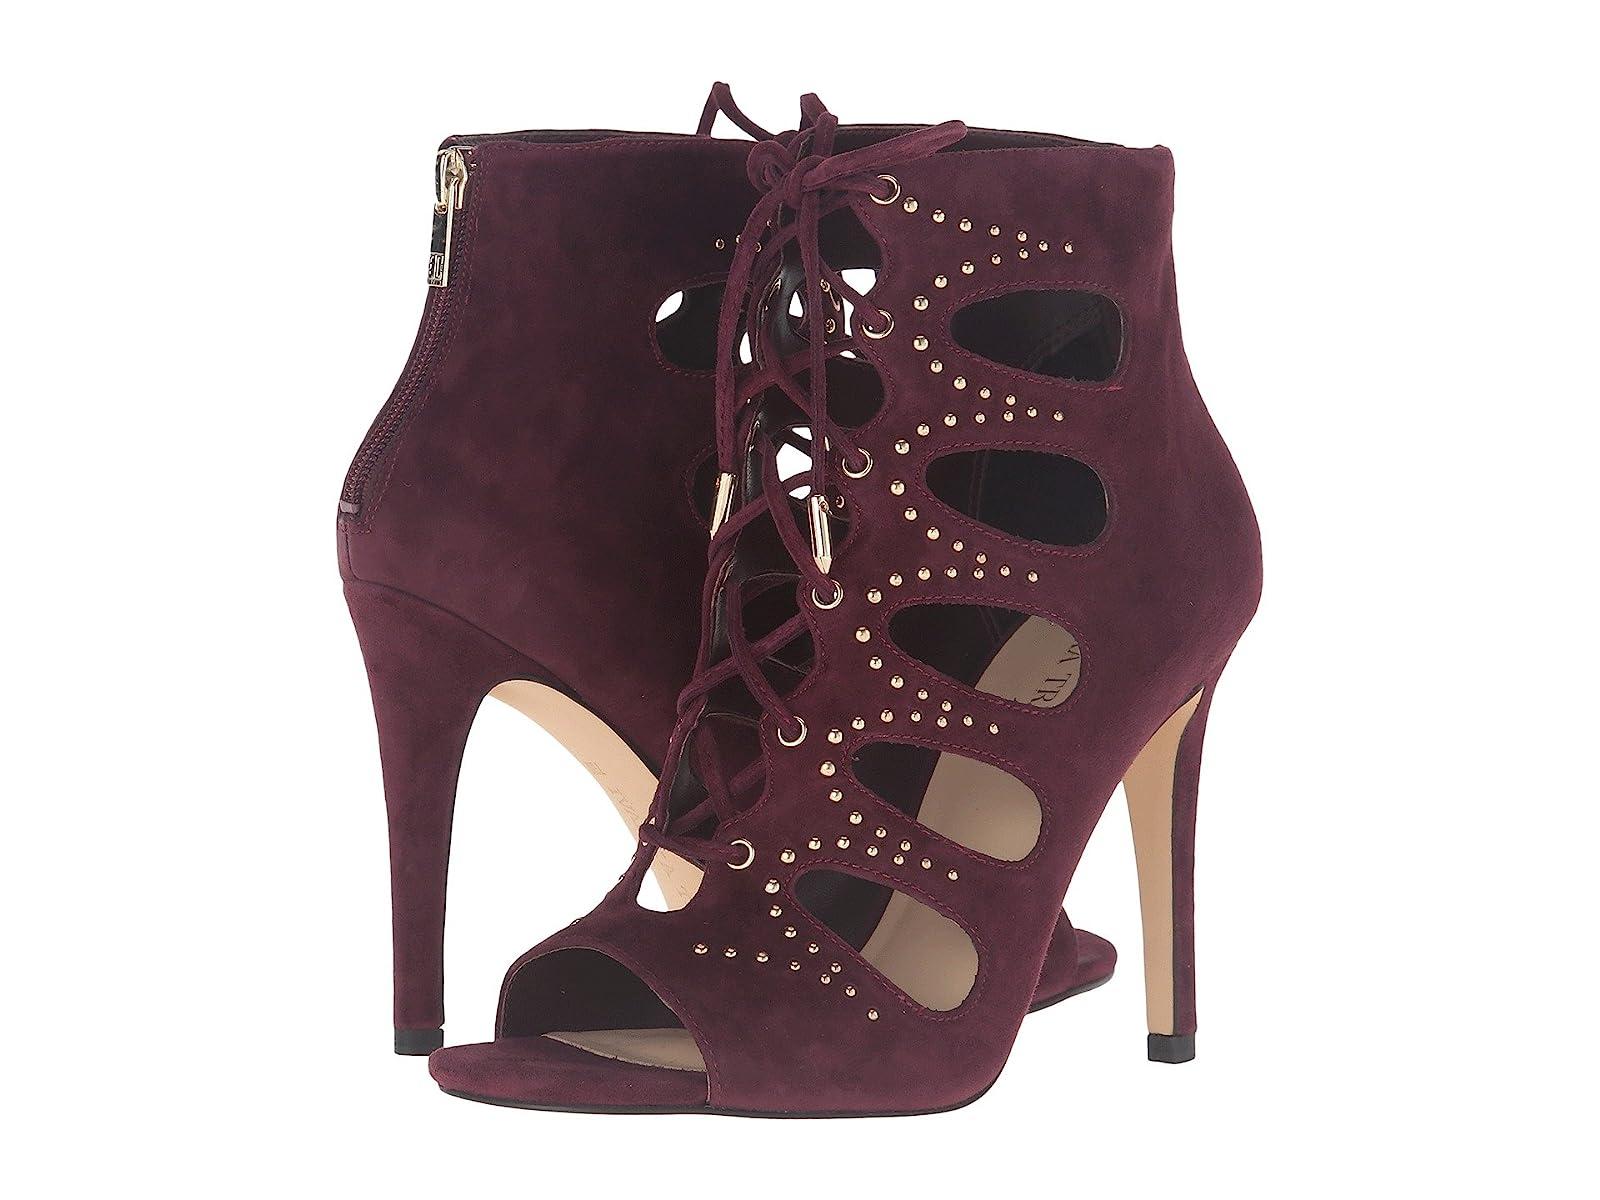 Ivanka Trump DazyCheap and distinctive eye-catching shoes